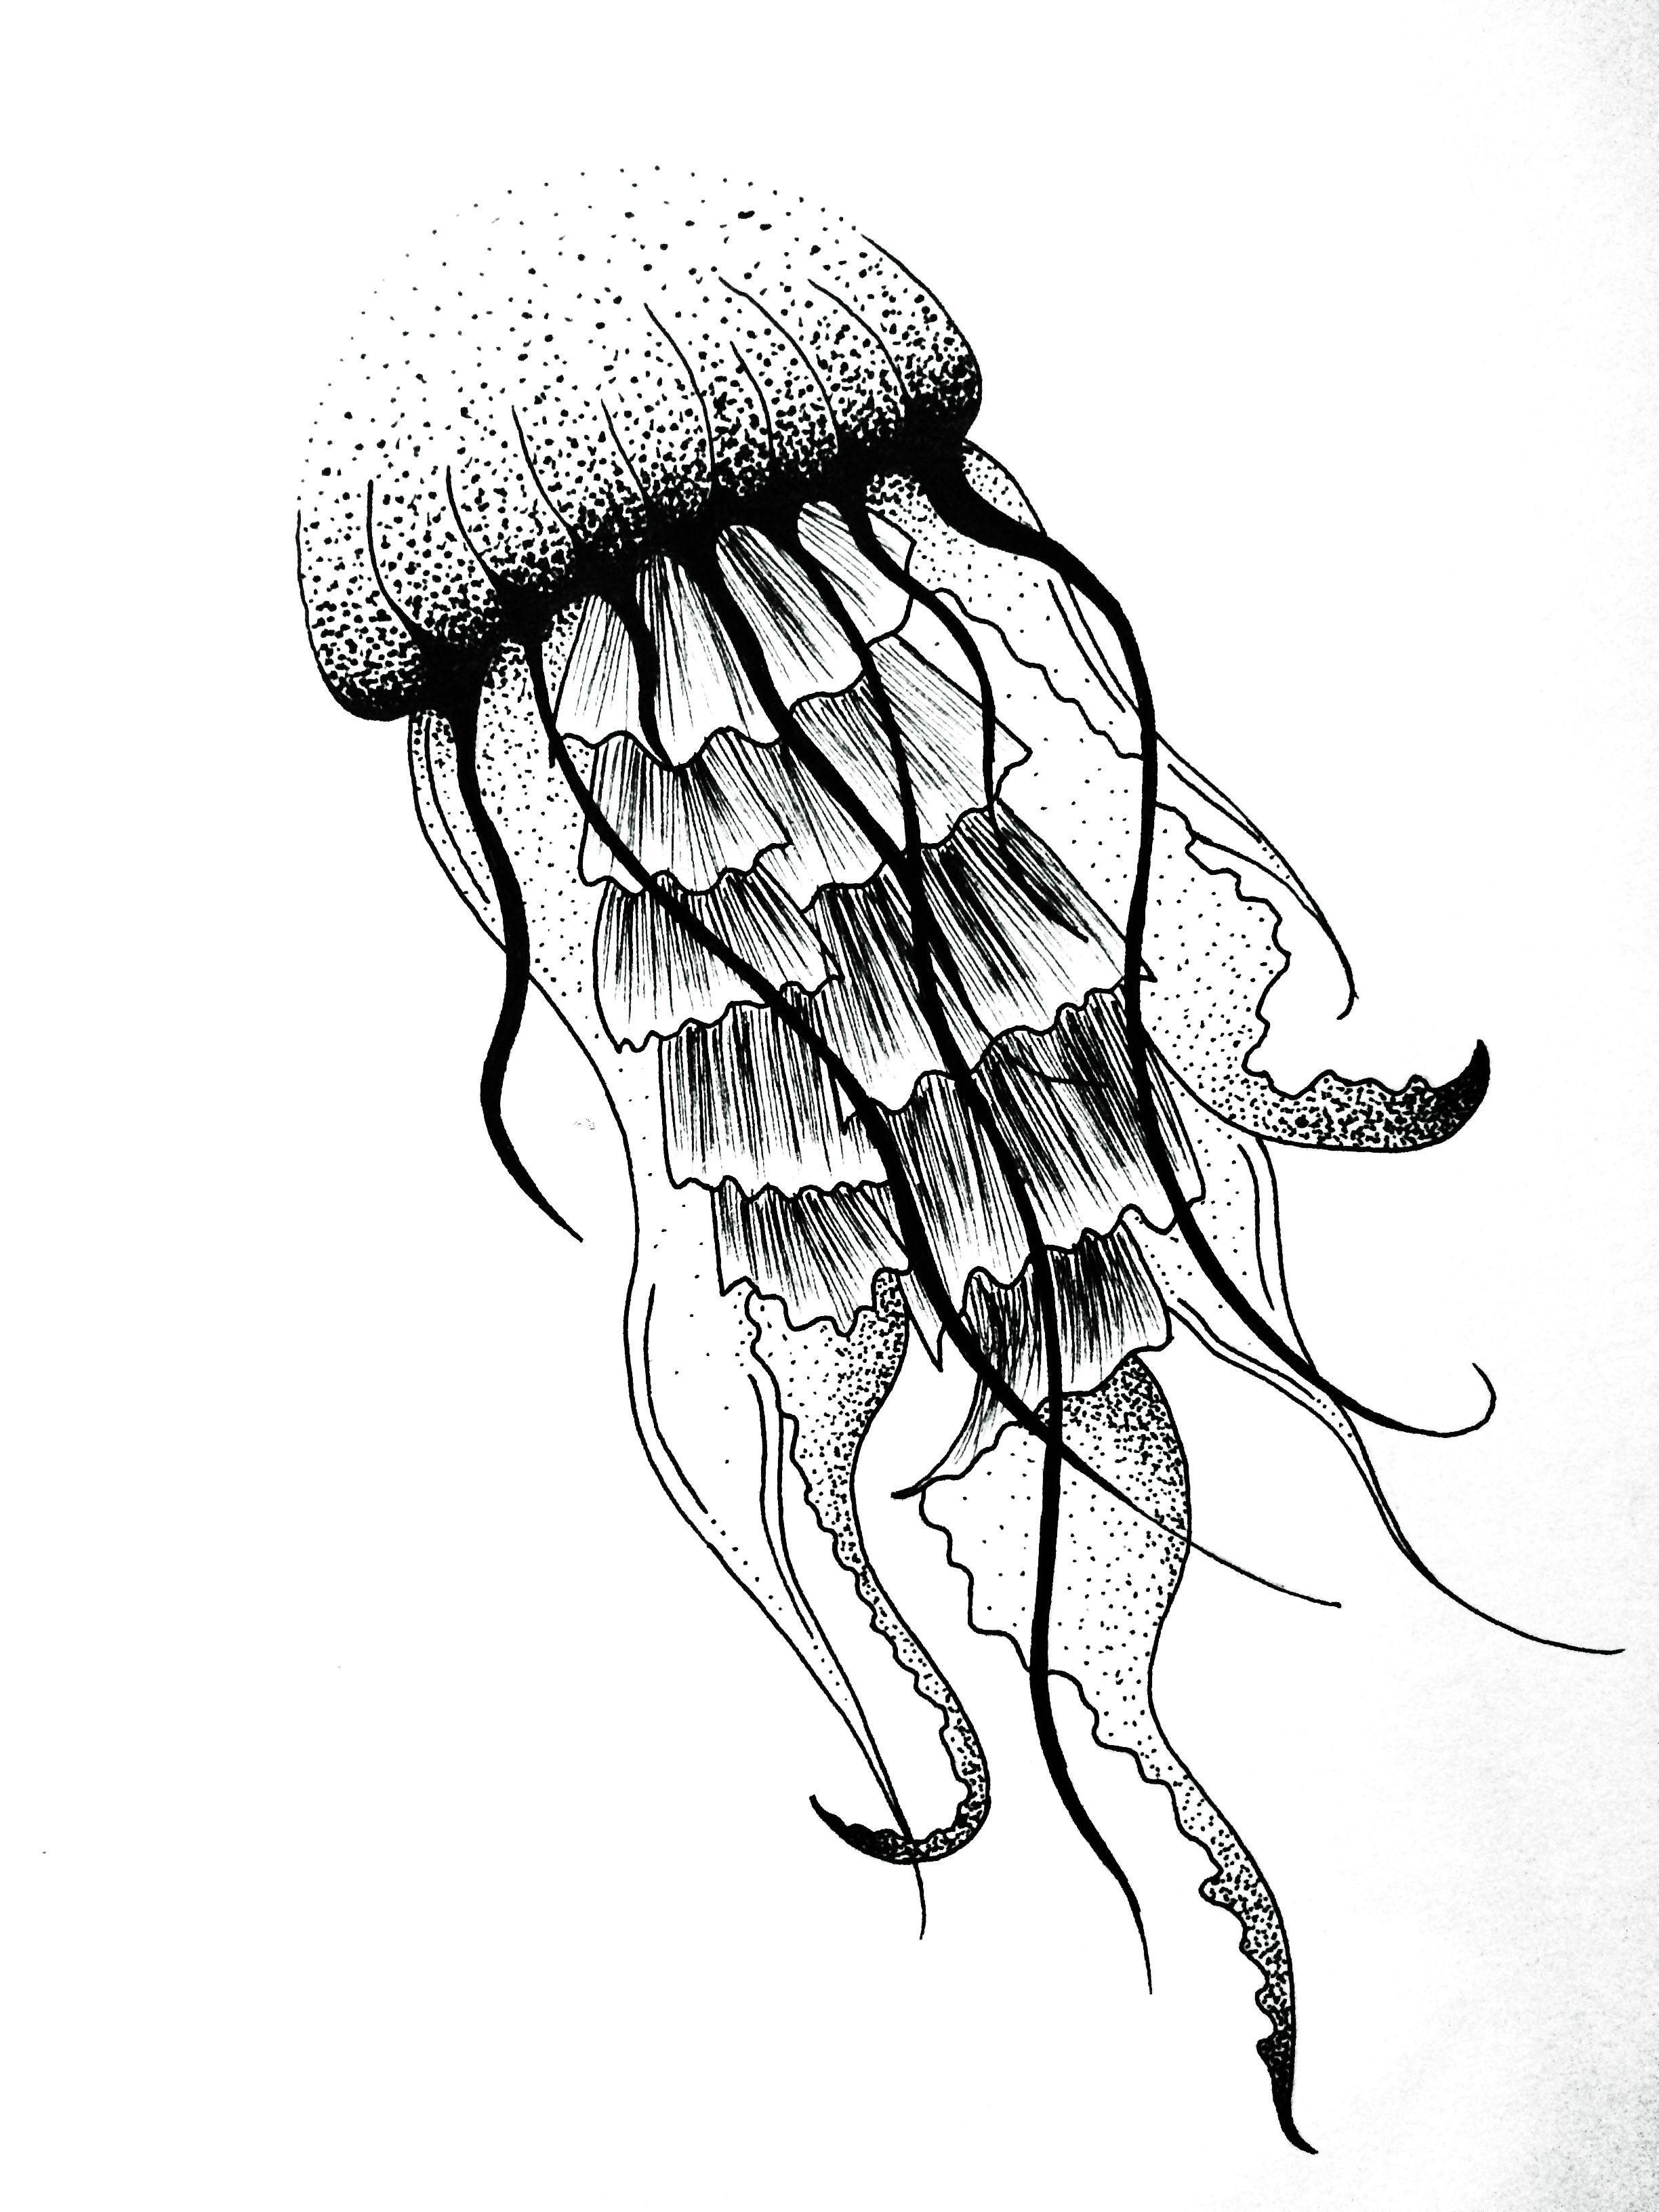 2448x3264 Jellyfish Dotwork Art Design Tattoo Jules Verne Graphic